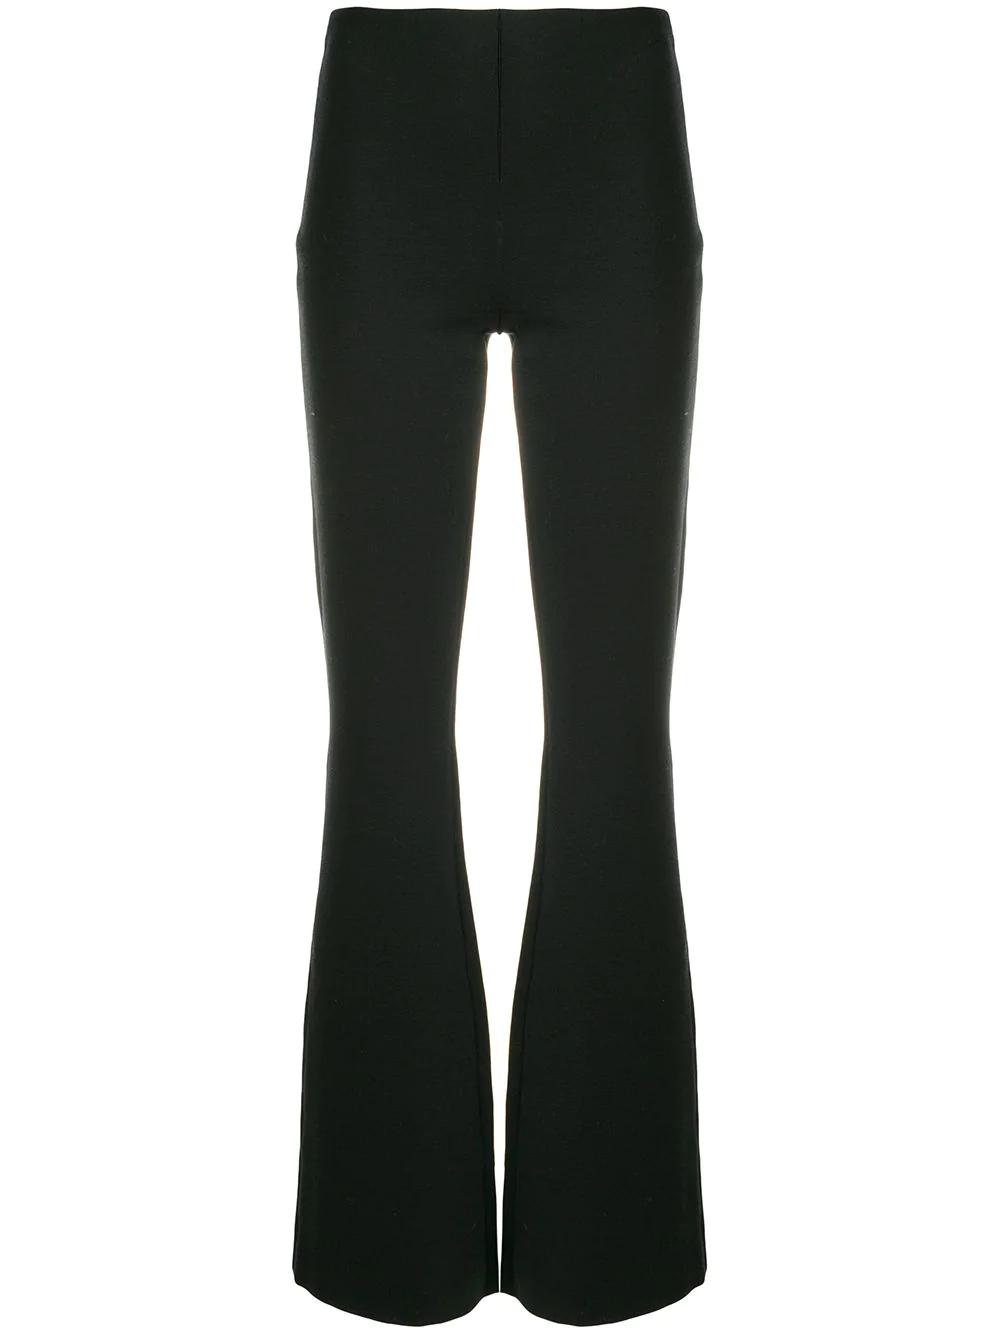 MOSCHINO | трикотажные брюки клеш | Clouty